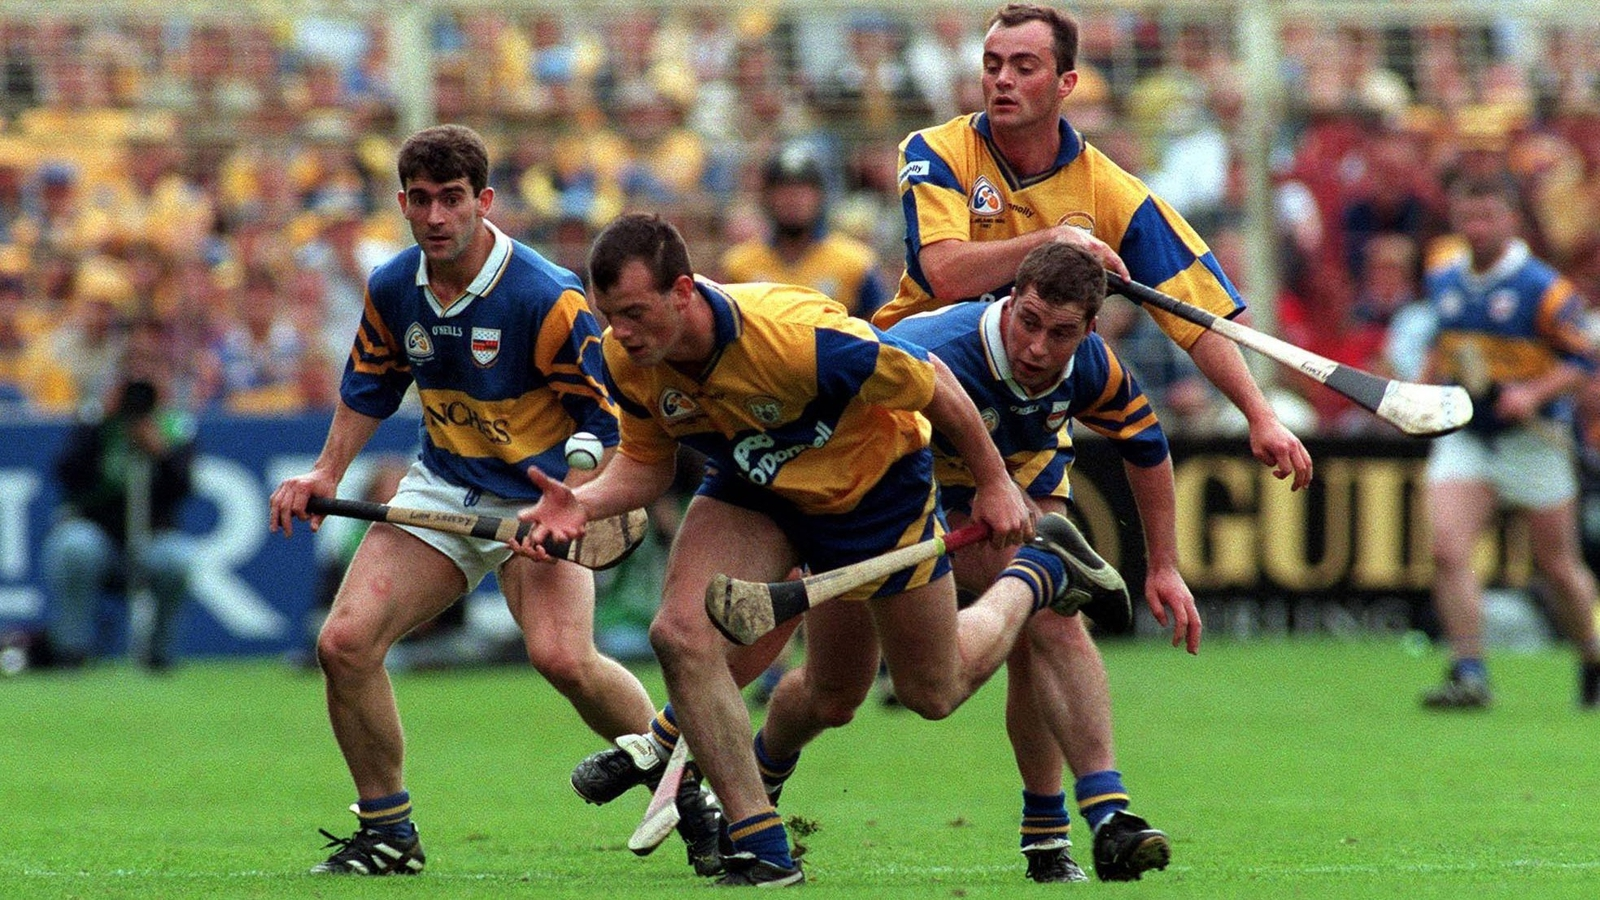 Image - Ollie Baker battles for possession in 1997 All-Ireland final